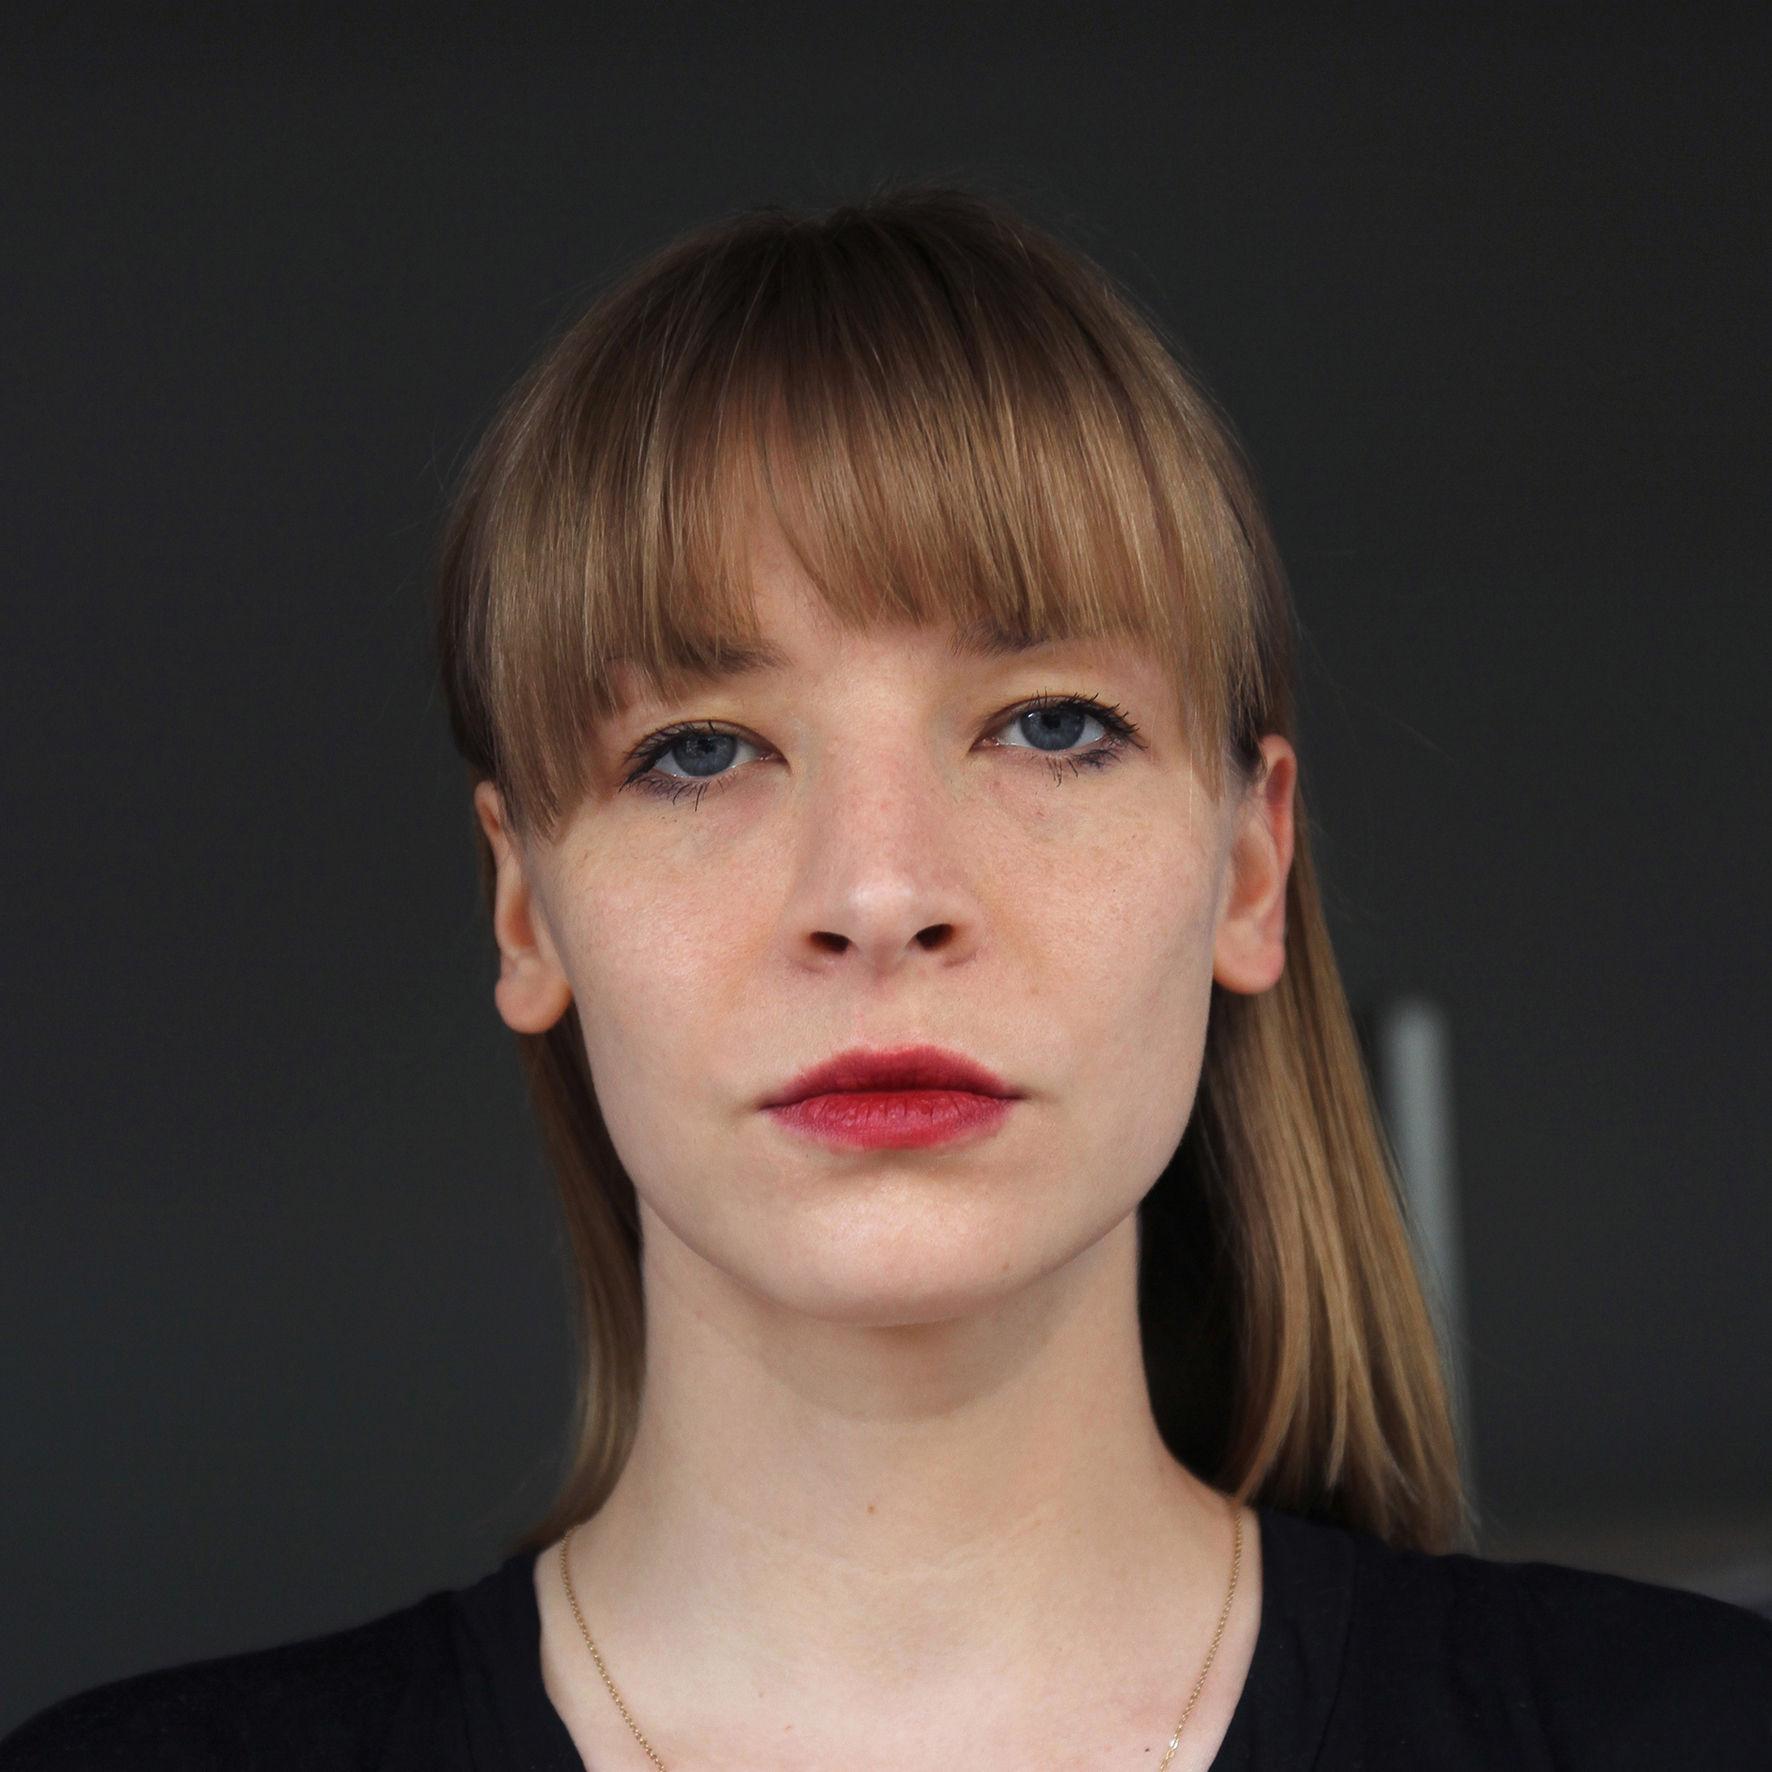 Agnieszka Polska